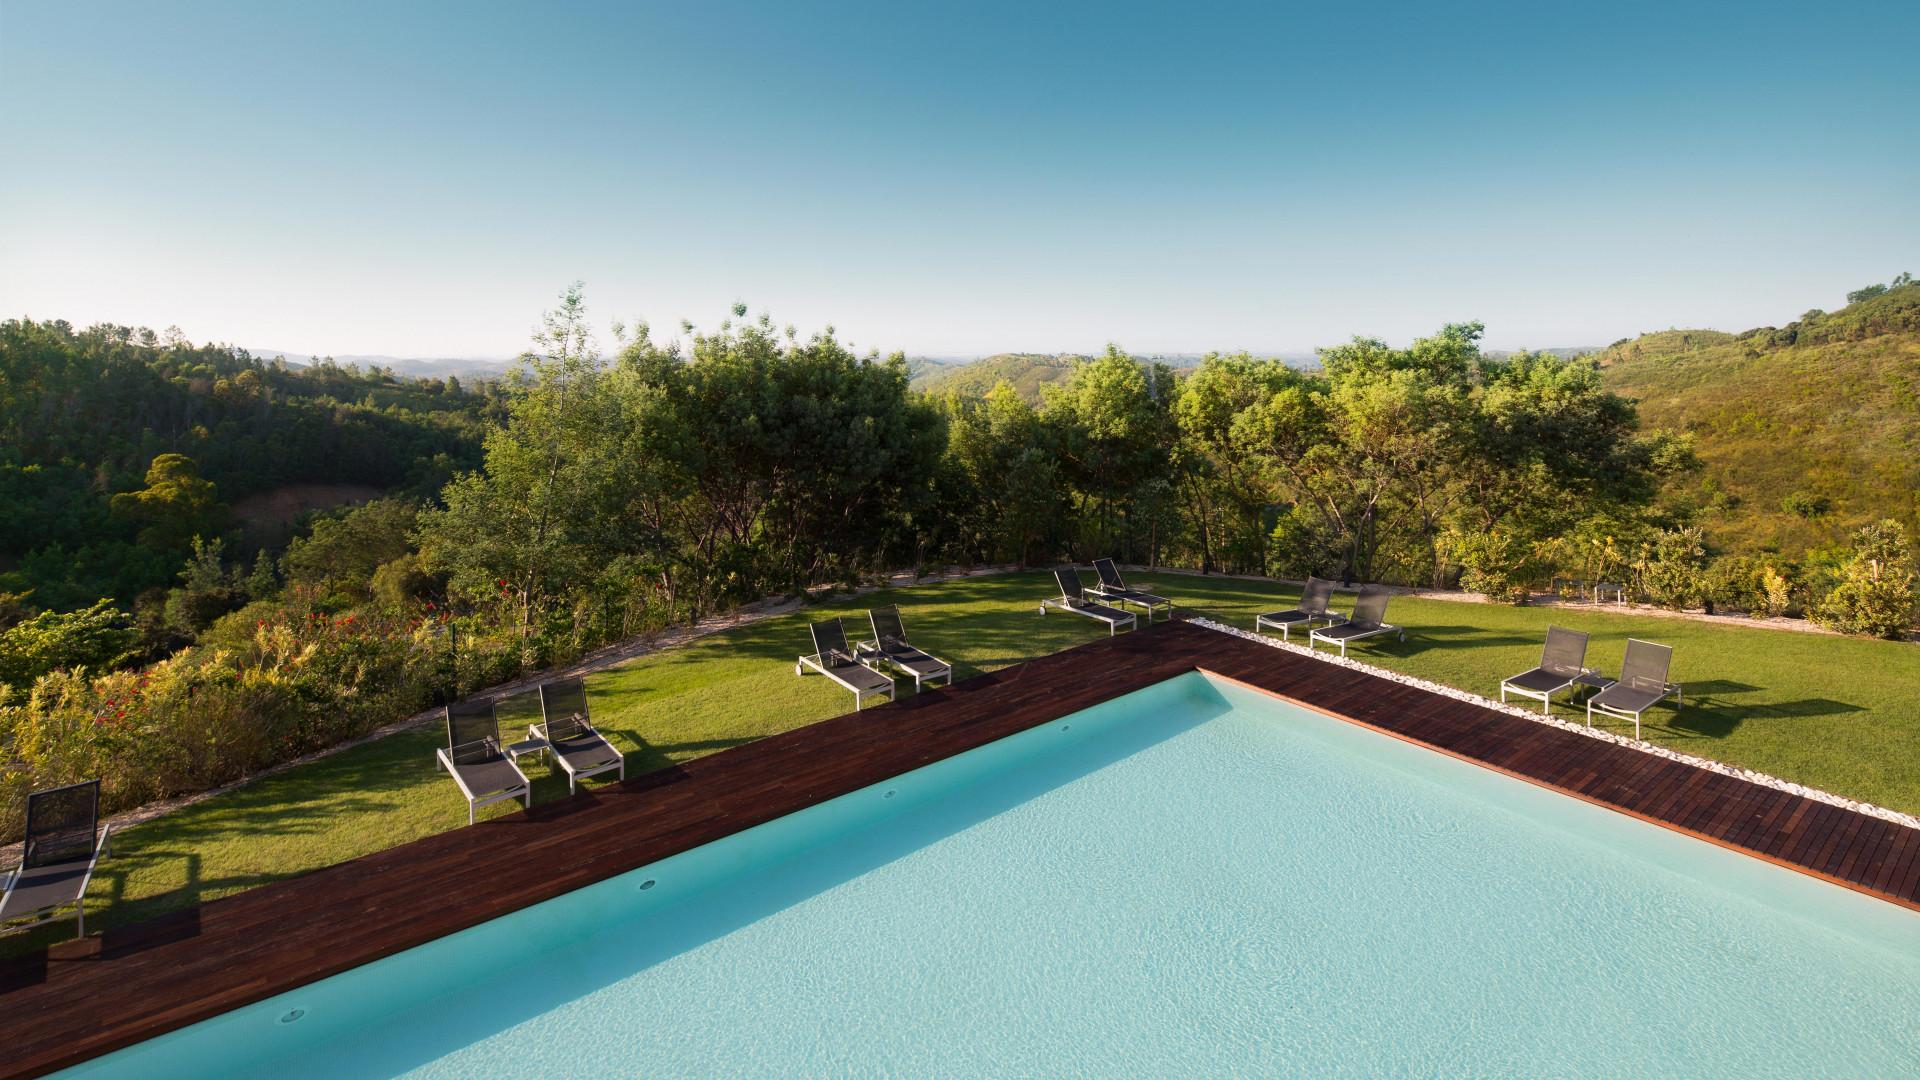 Pool at Macdonald Monchique Resort & Spa, Algarve